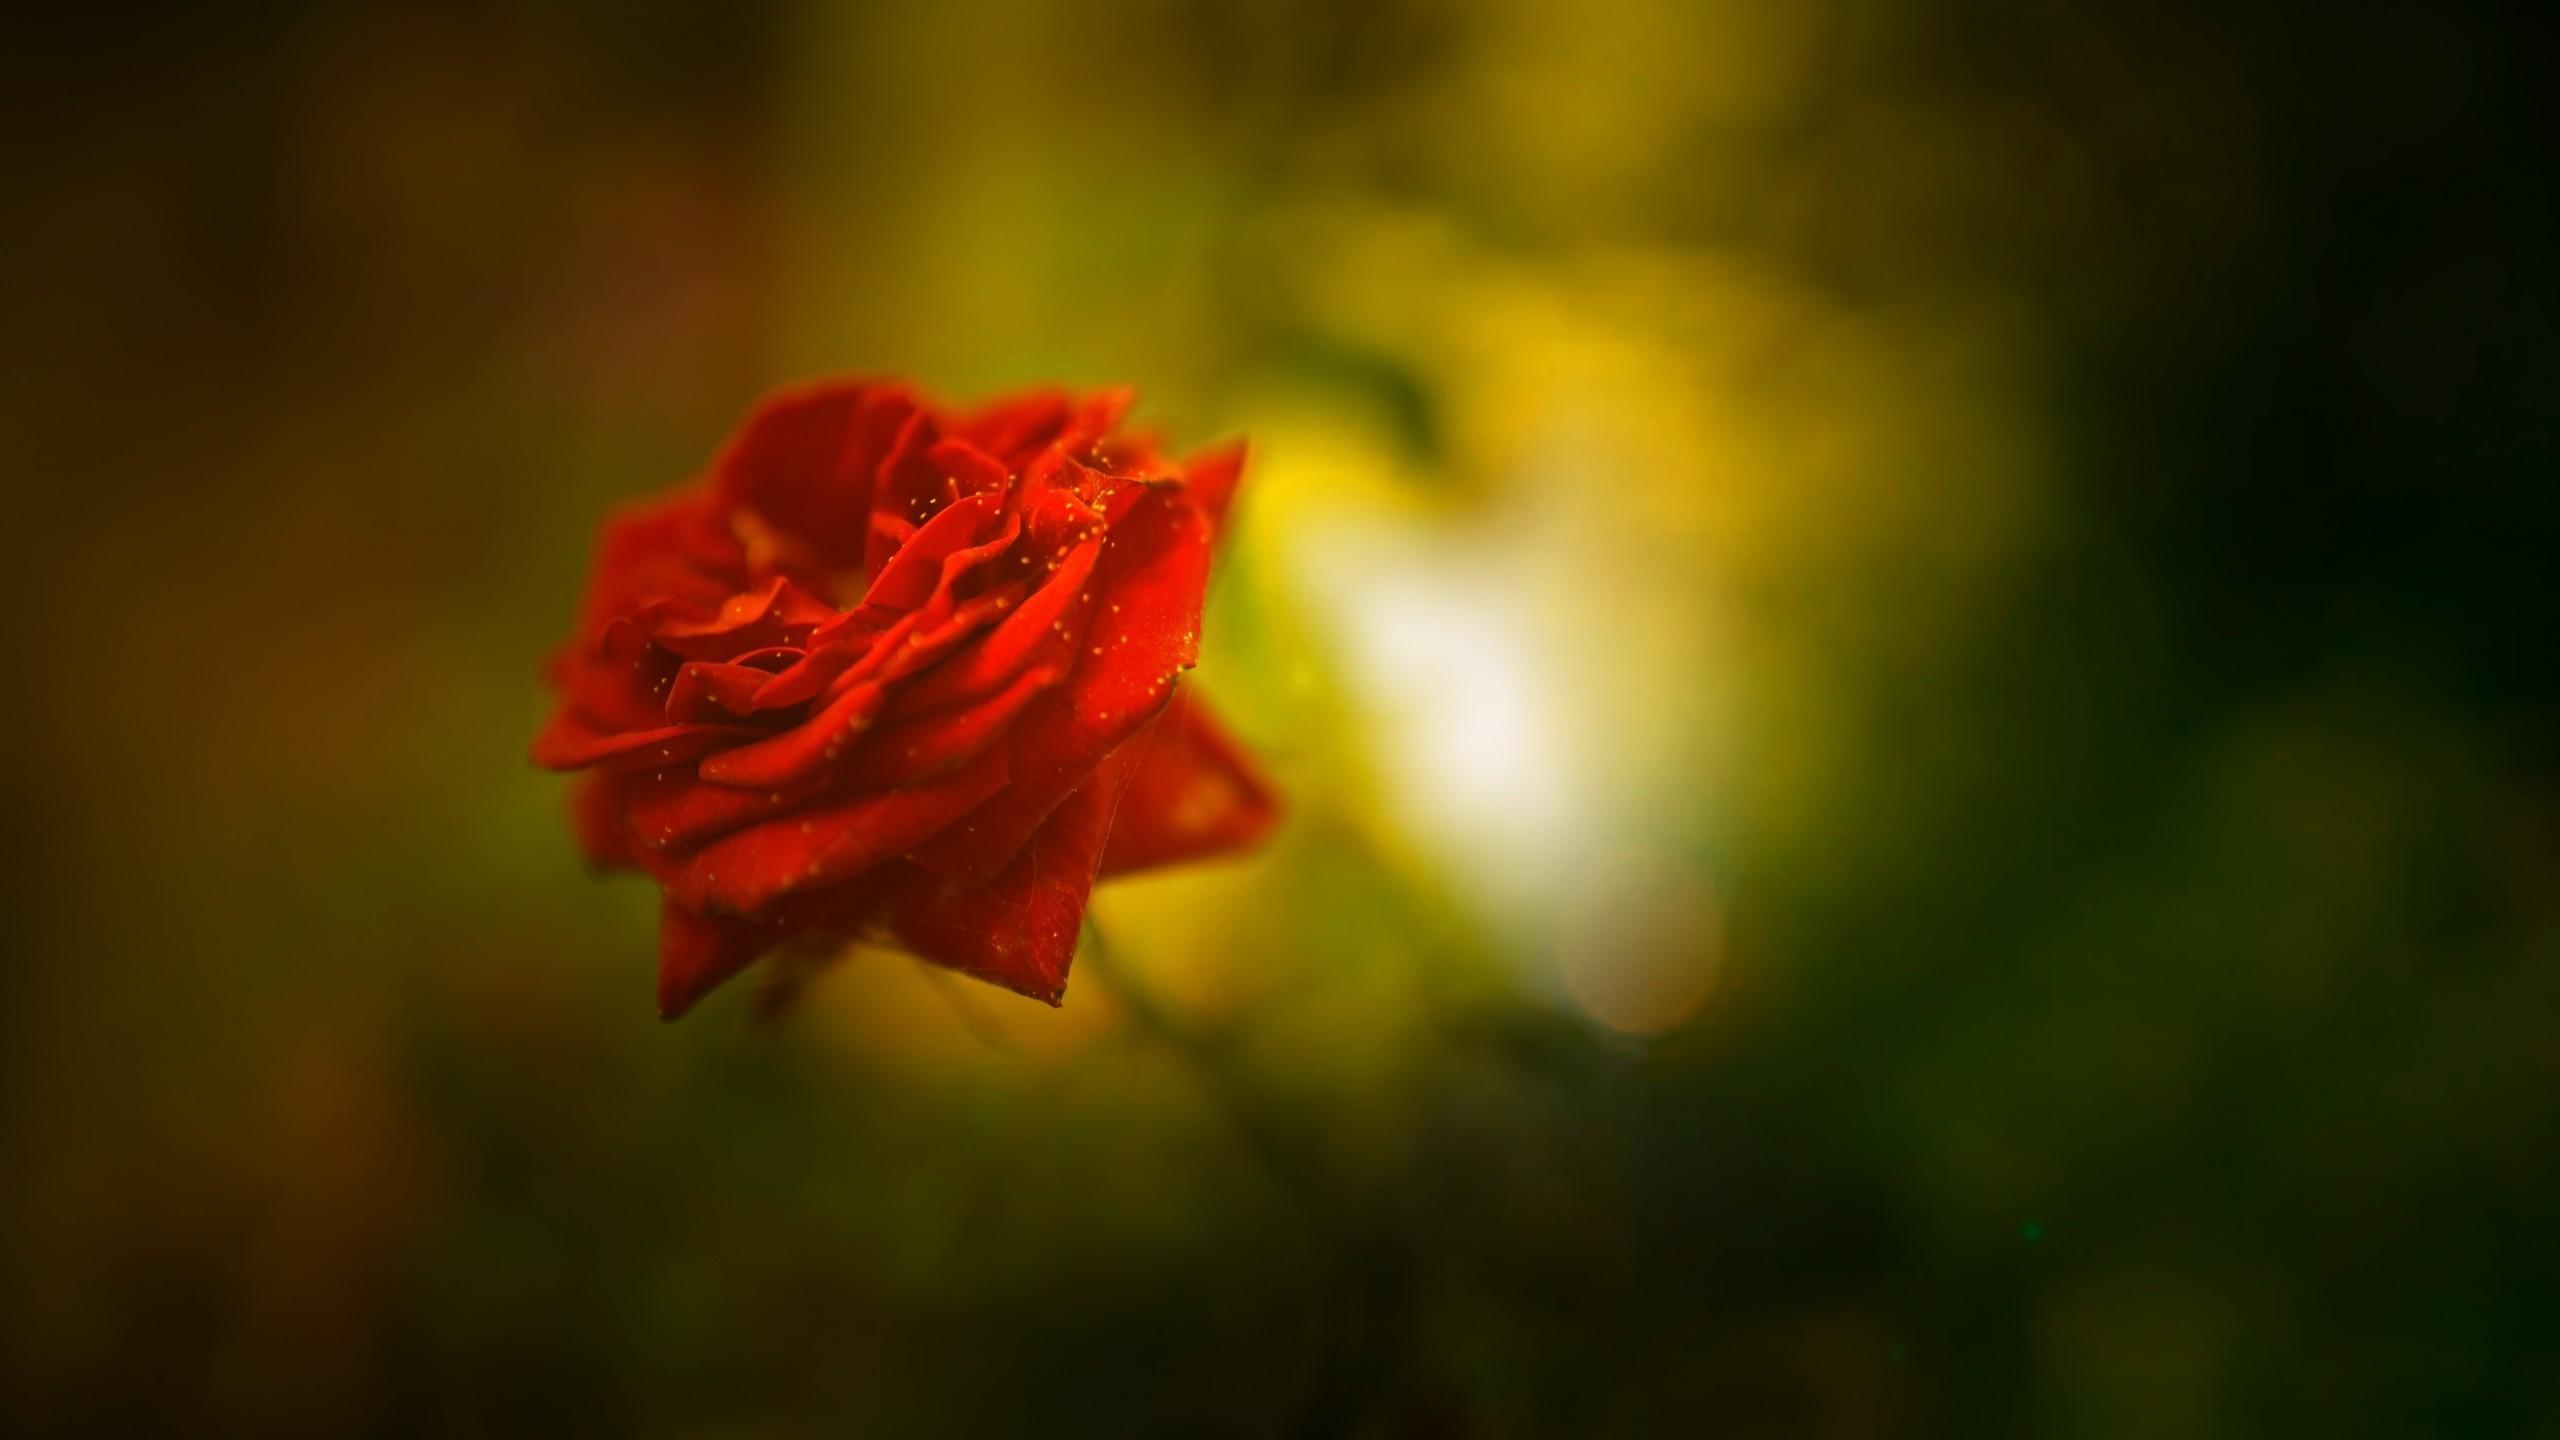 Flowers / Red Rose Wallpaper